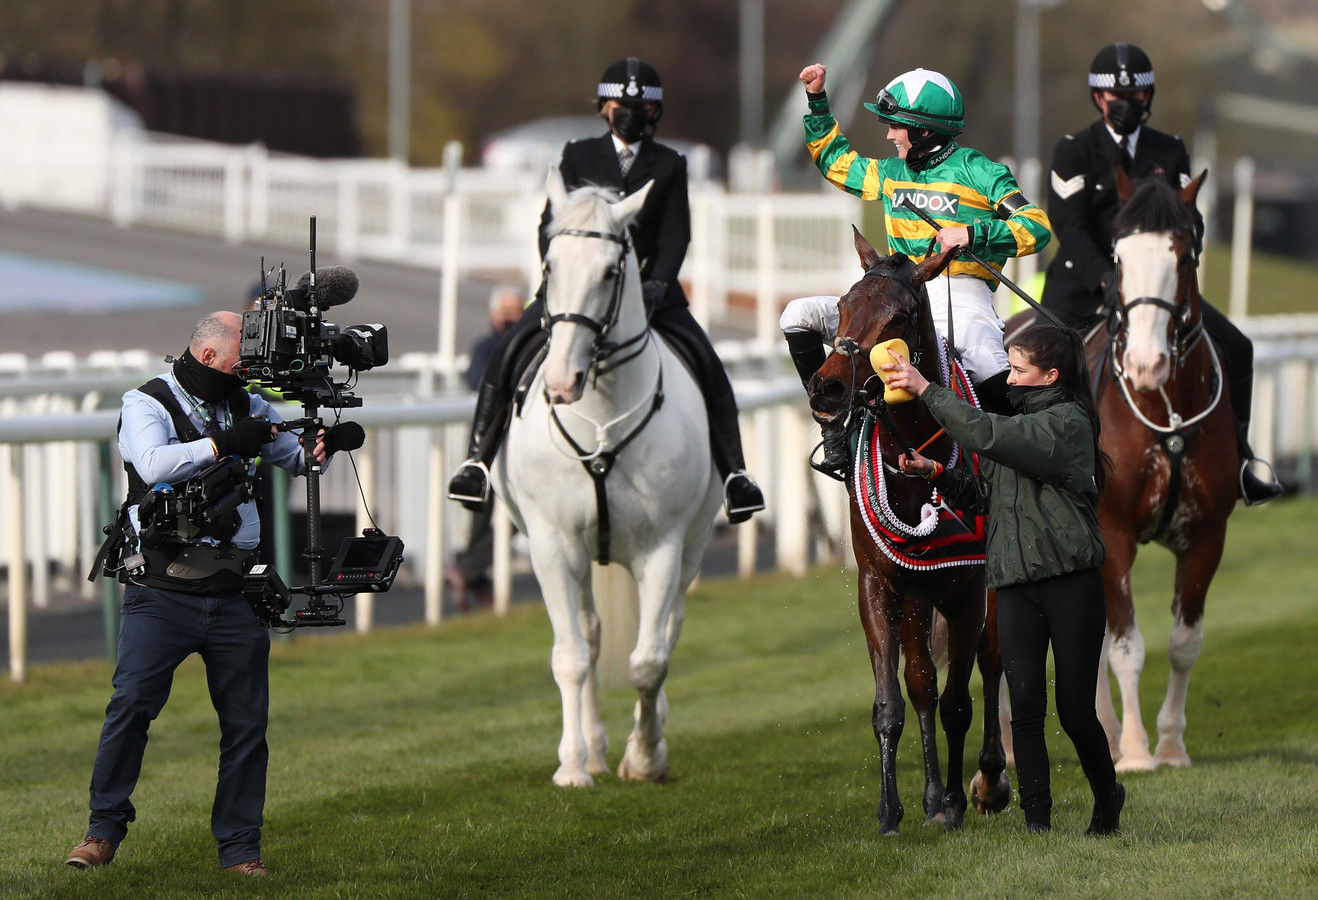 Rachael Blackmore en haar paard Minella Times.